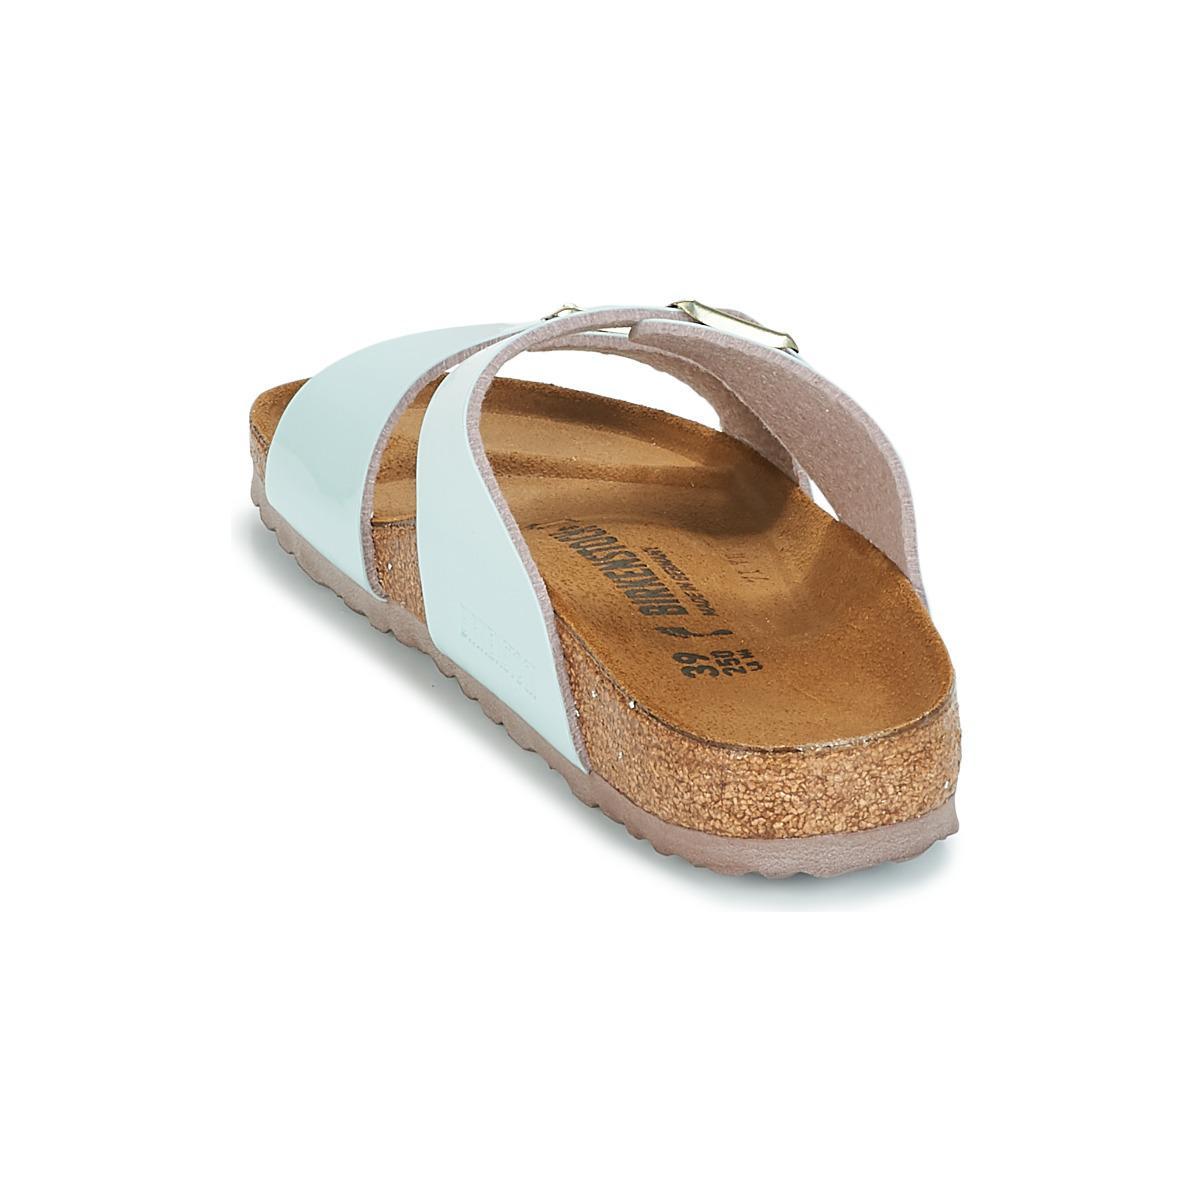 Birkenstock 15Lyst Save Mules Shoes Blue Casual Sydney In JK1Fcl